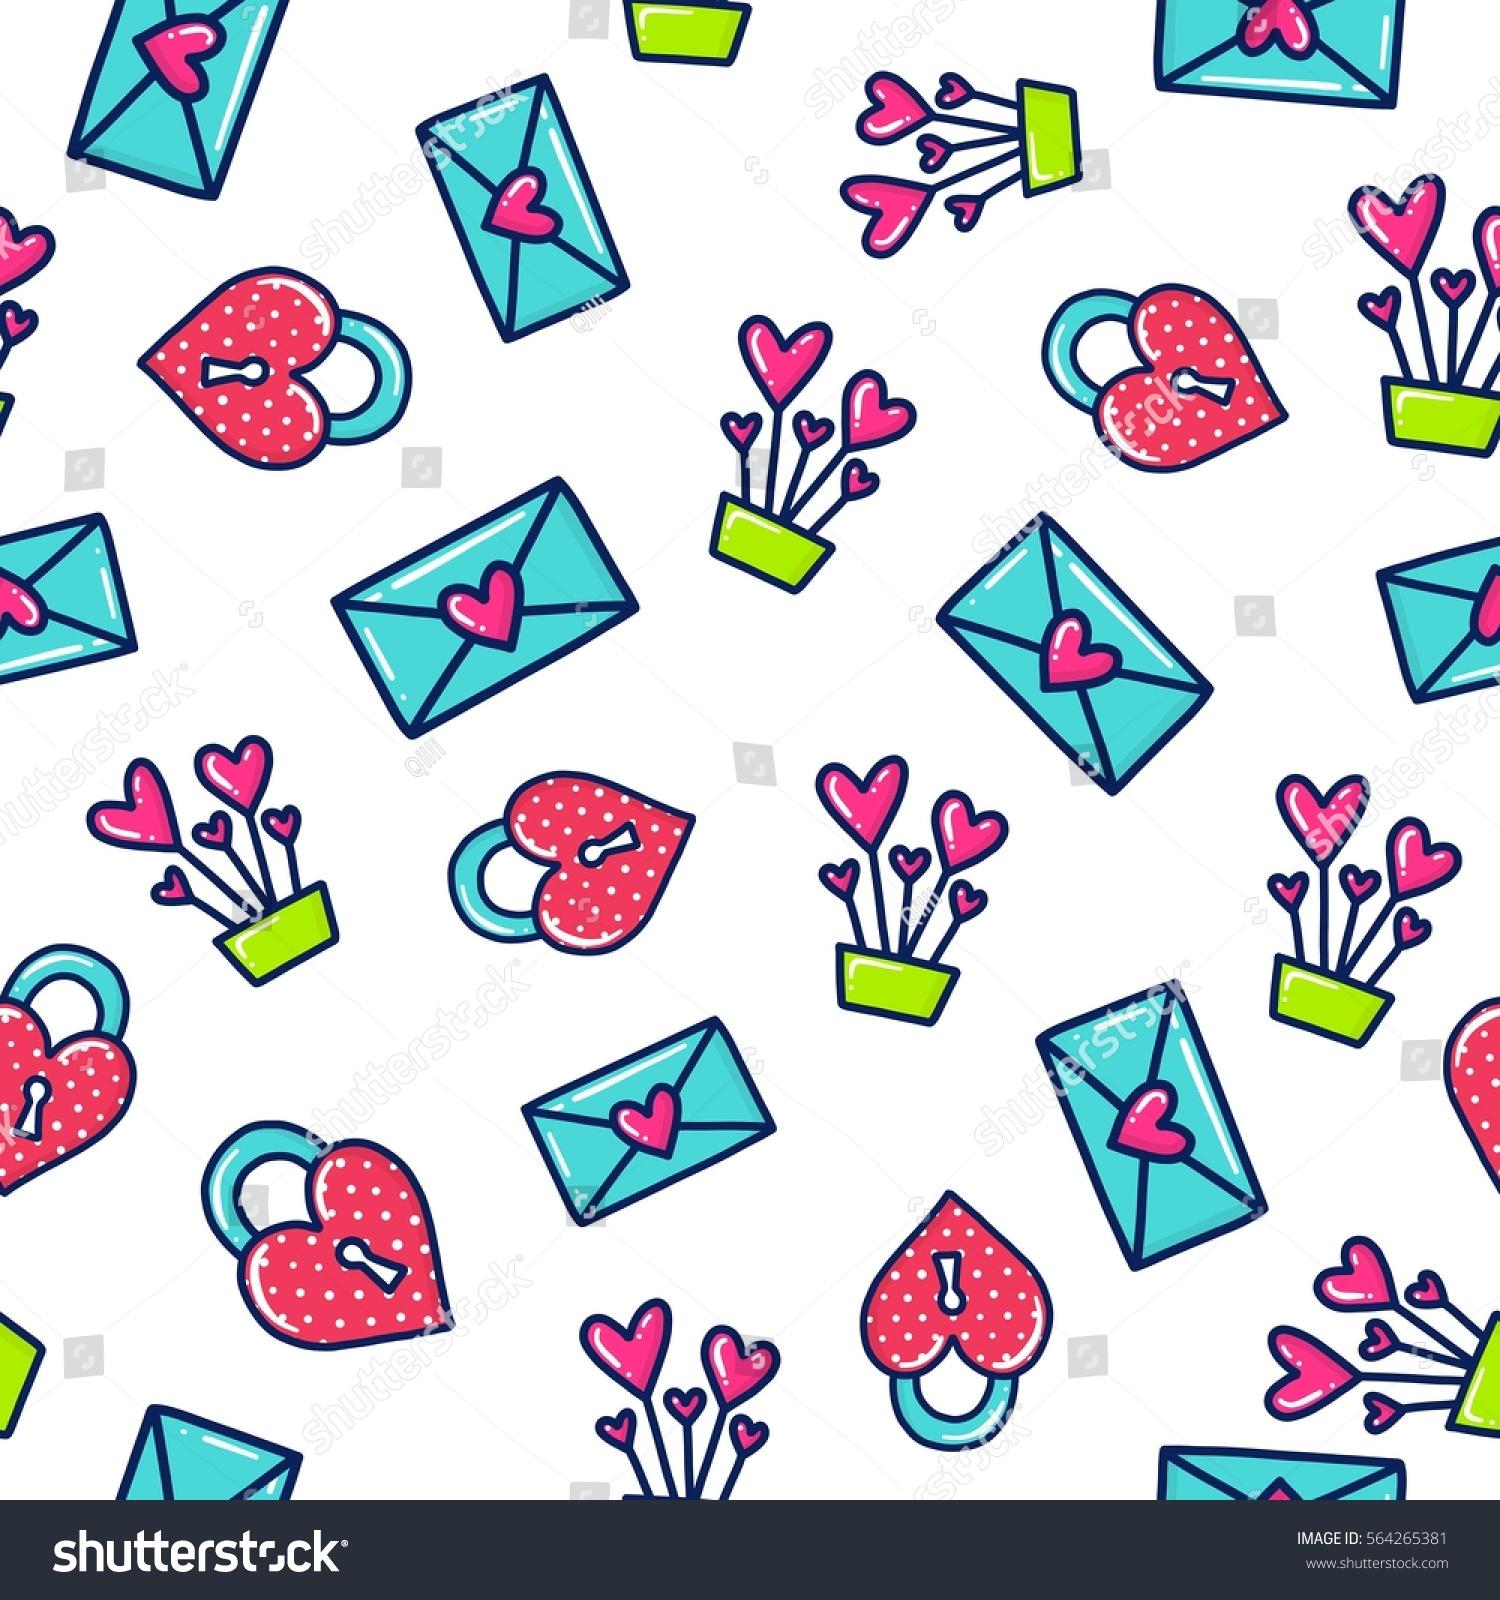 Shirt design envelope - Doodles Cute Seamless Pattern Color Vector Background Illustration With Hearts And Envelope Design